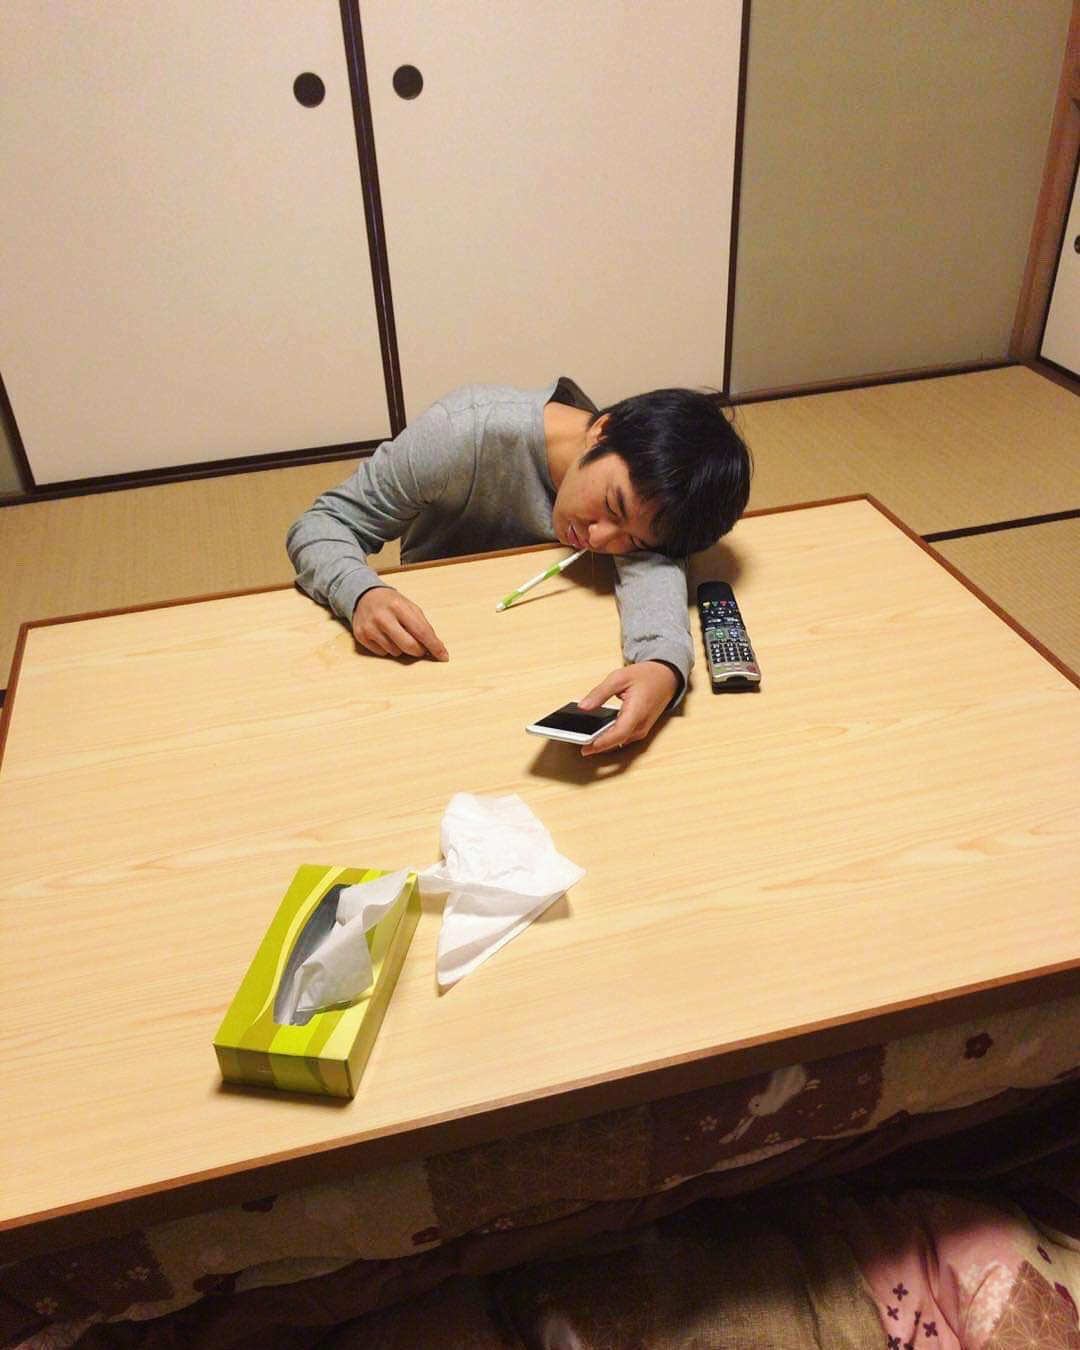 Jun, one of our producers, fell asleep while brushing teeth... Otsukaresama!! 歯磨きしながら寝るプロデューサー… お疲れ様です︎ . . . . .